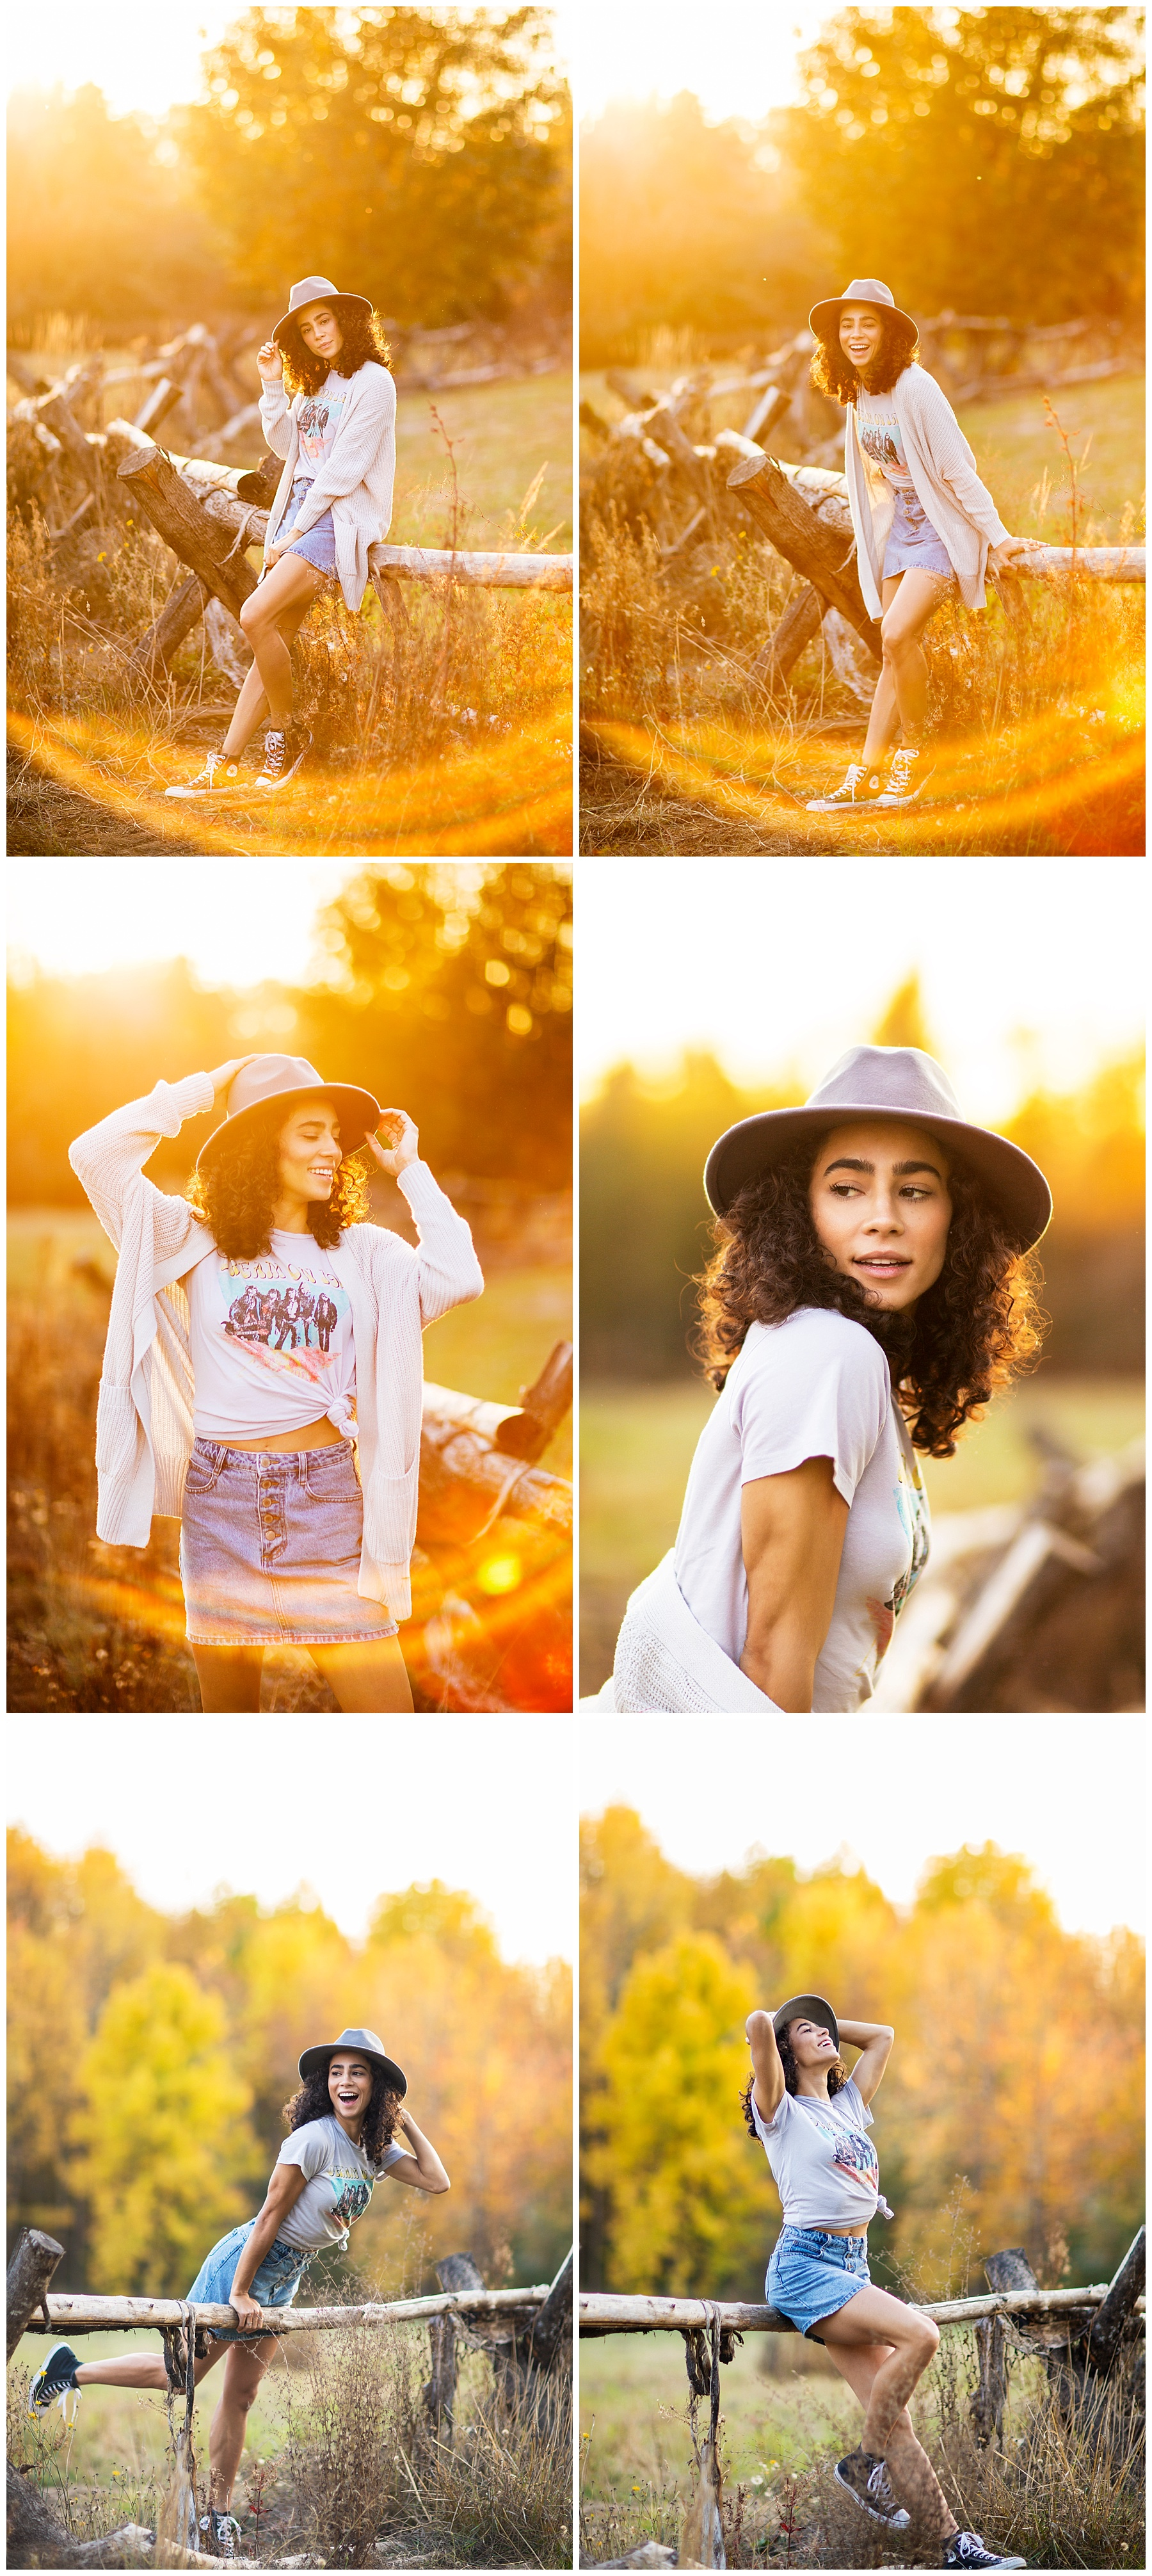 Morgan Pope Lifestyle Model Fall Photoshoot Portland Oregon 5.jpg